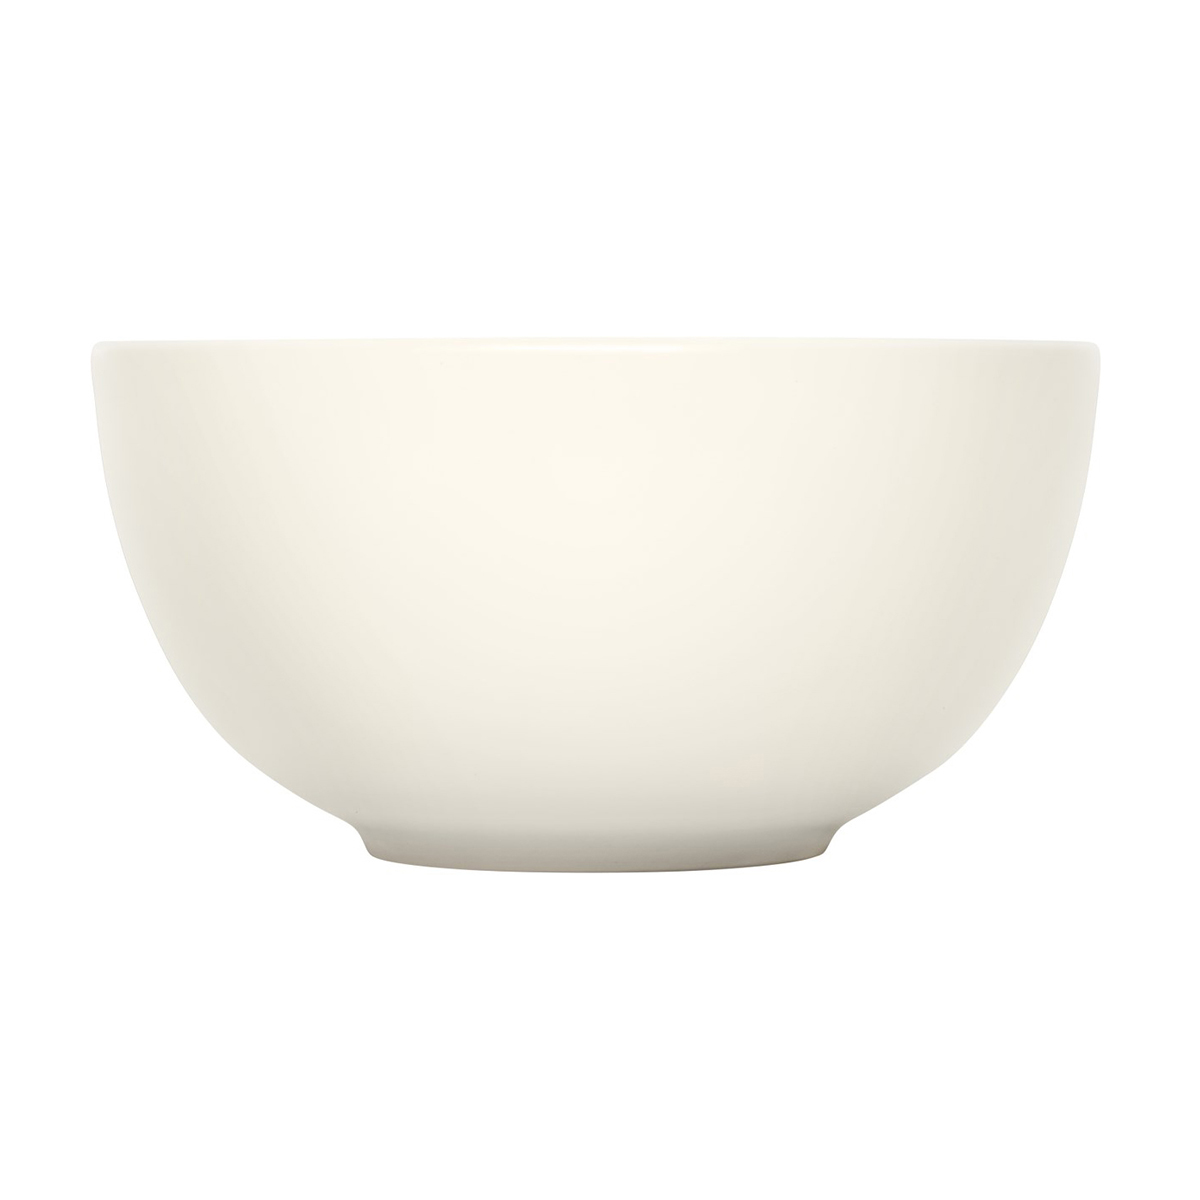 Teema_bowl_1.65L_white